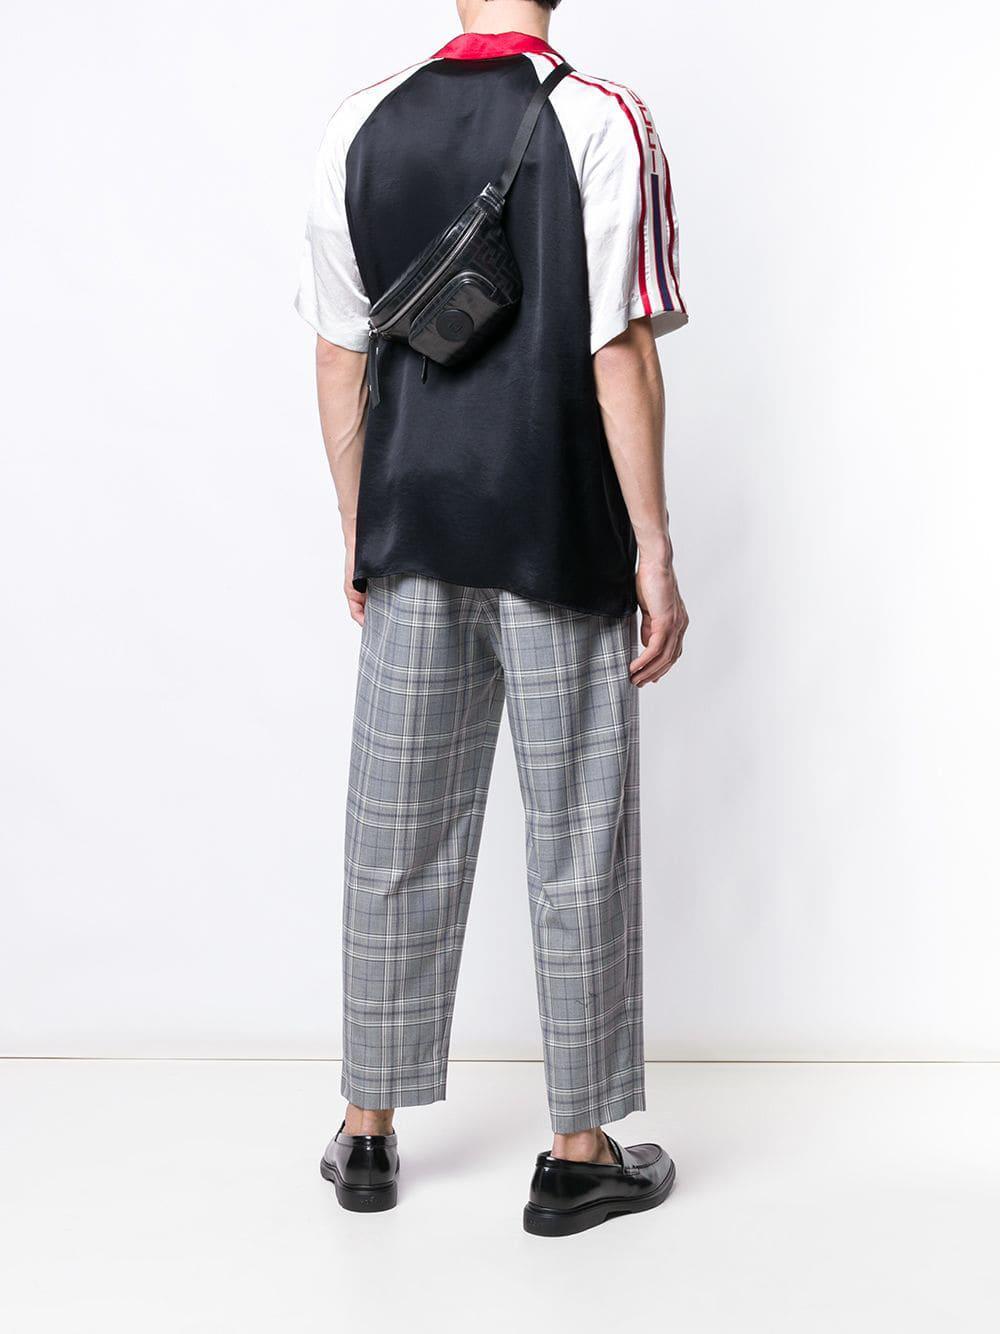 b2a4e0ef1b9 Lyst - Fendi Ff Belt Bag in Black for Men